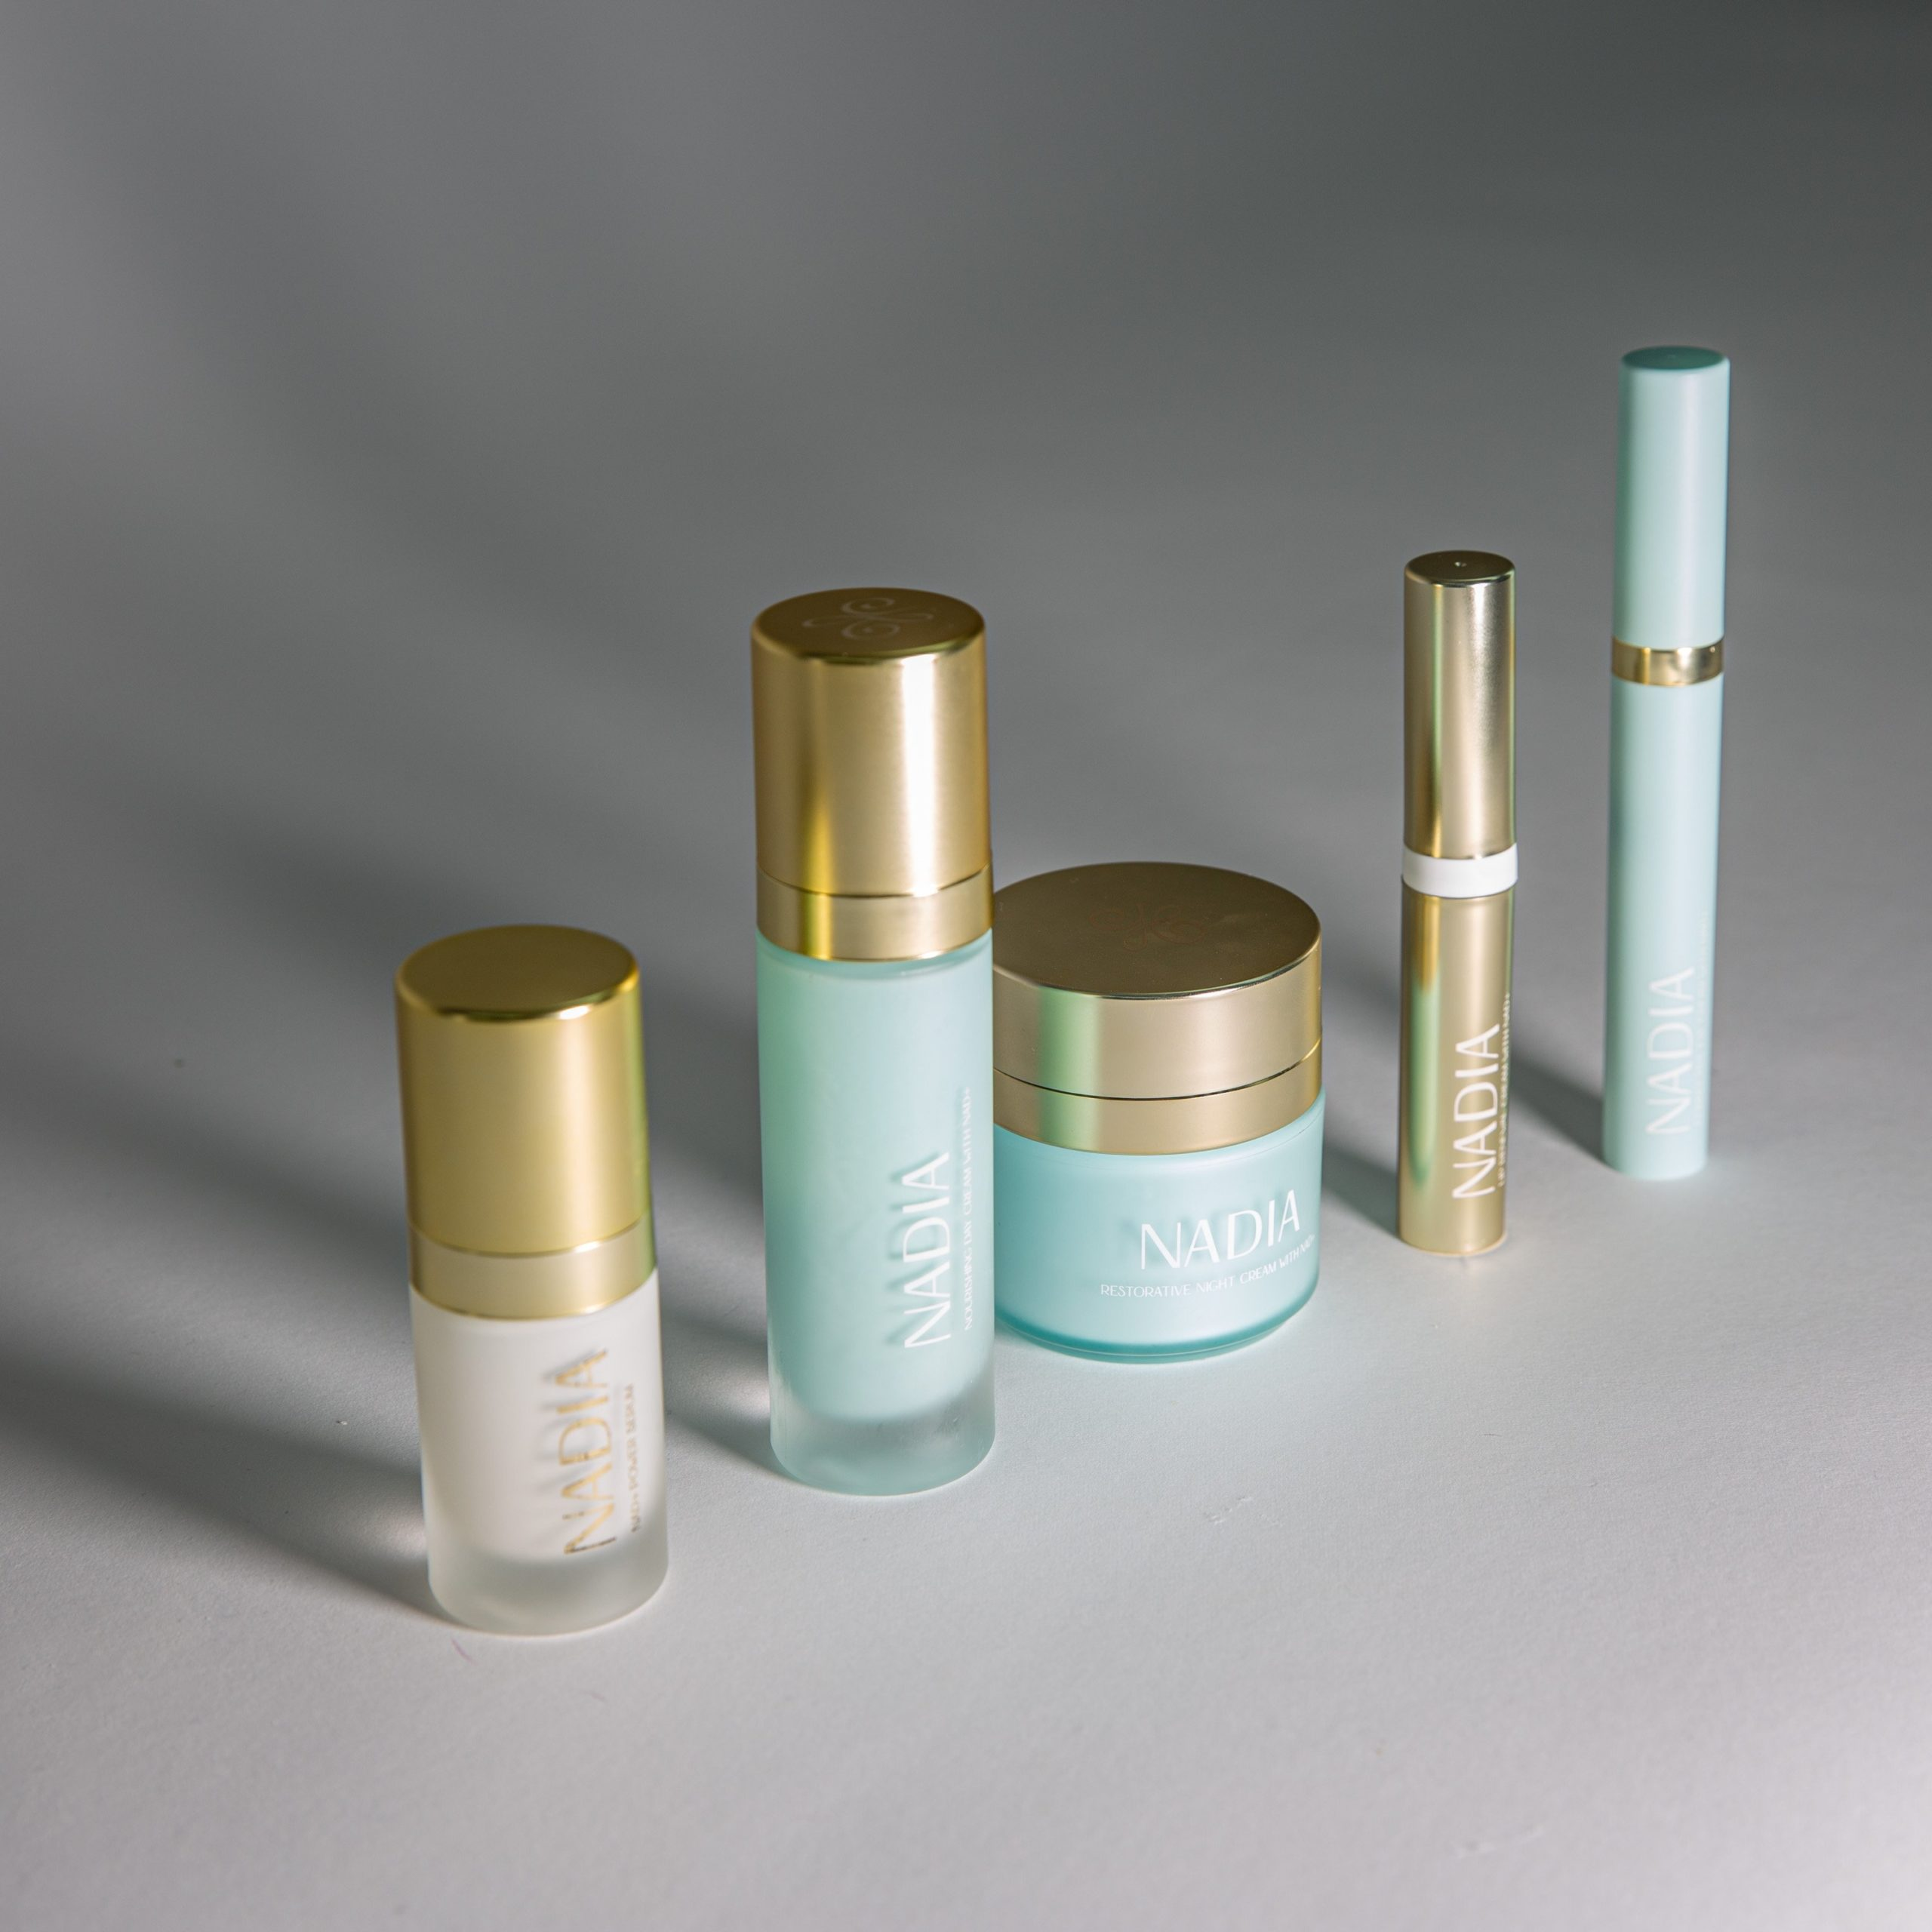 NADIA skincare product line